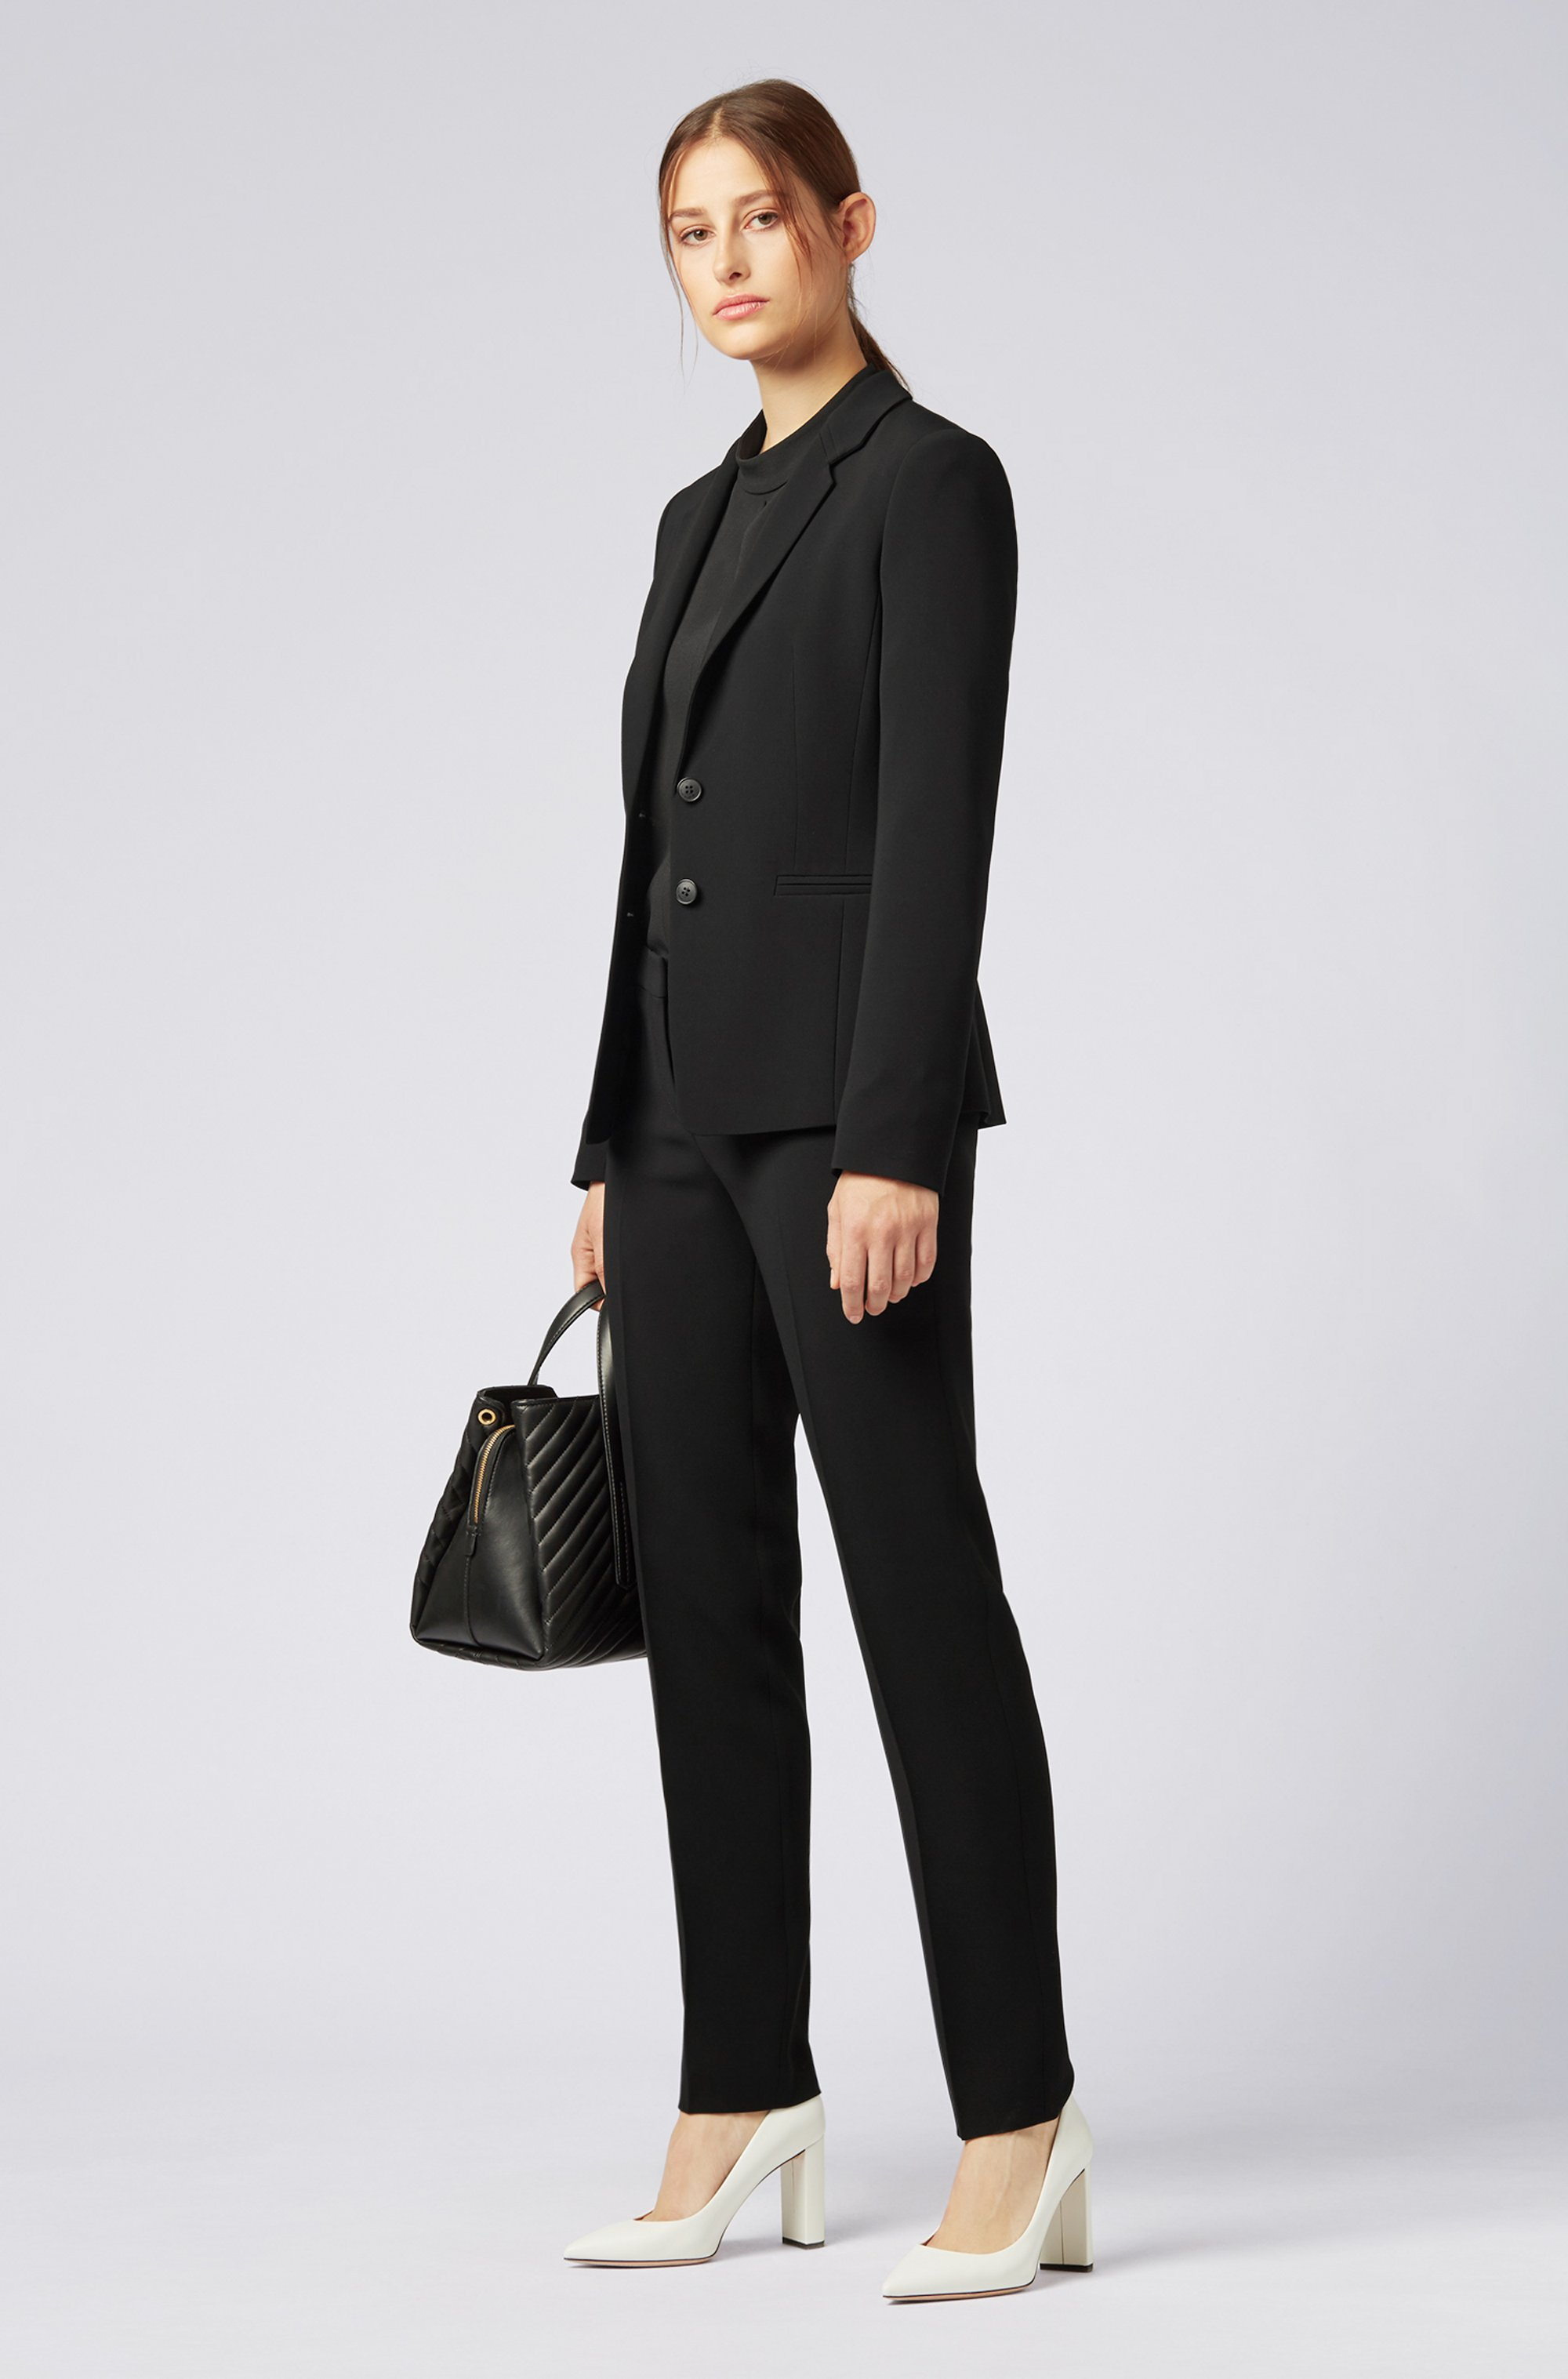 Slim-fit trousers in crease-resistant Japanese crepe